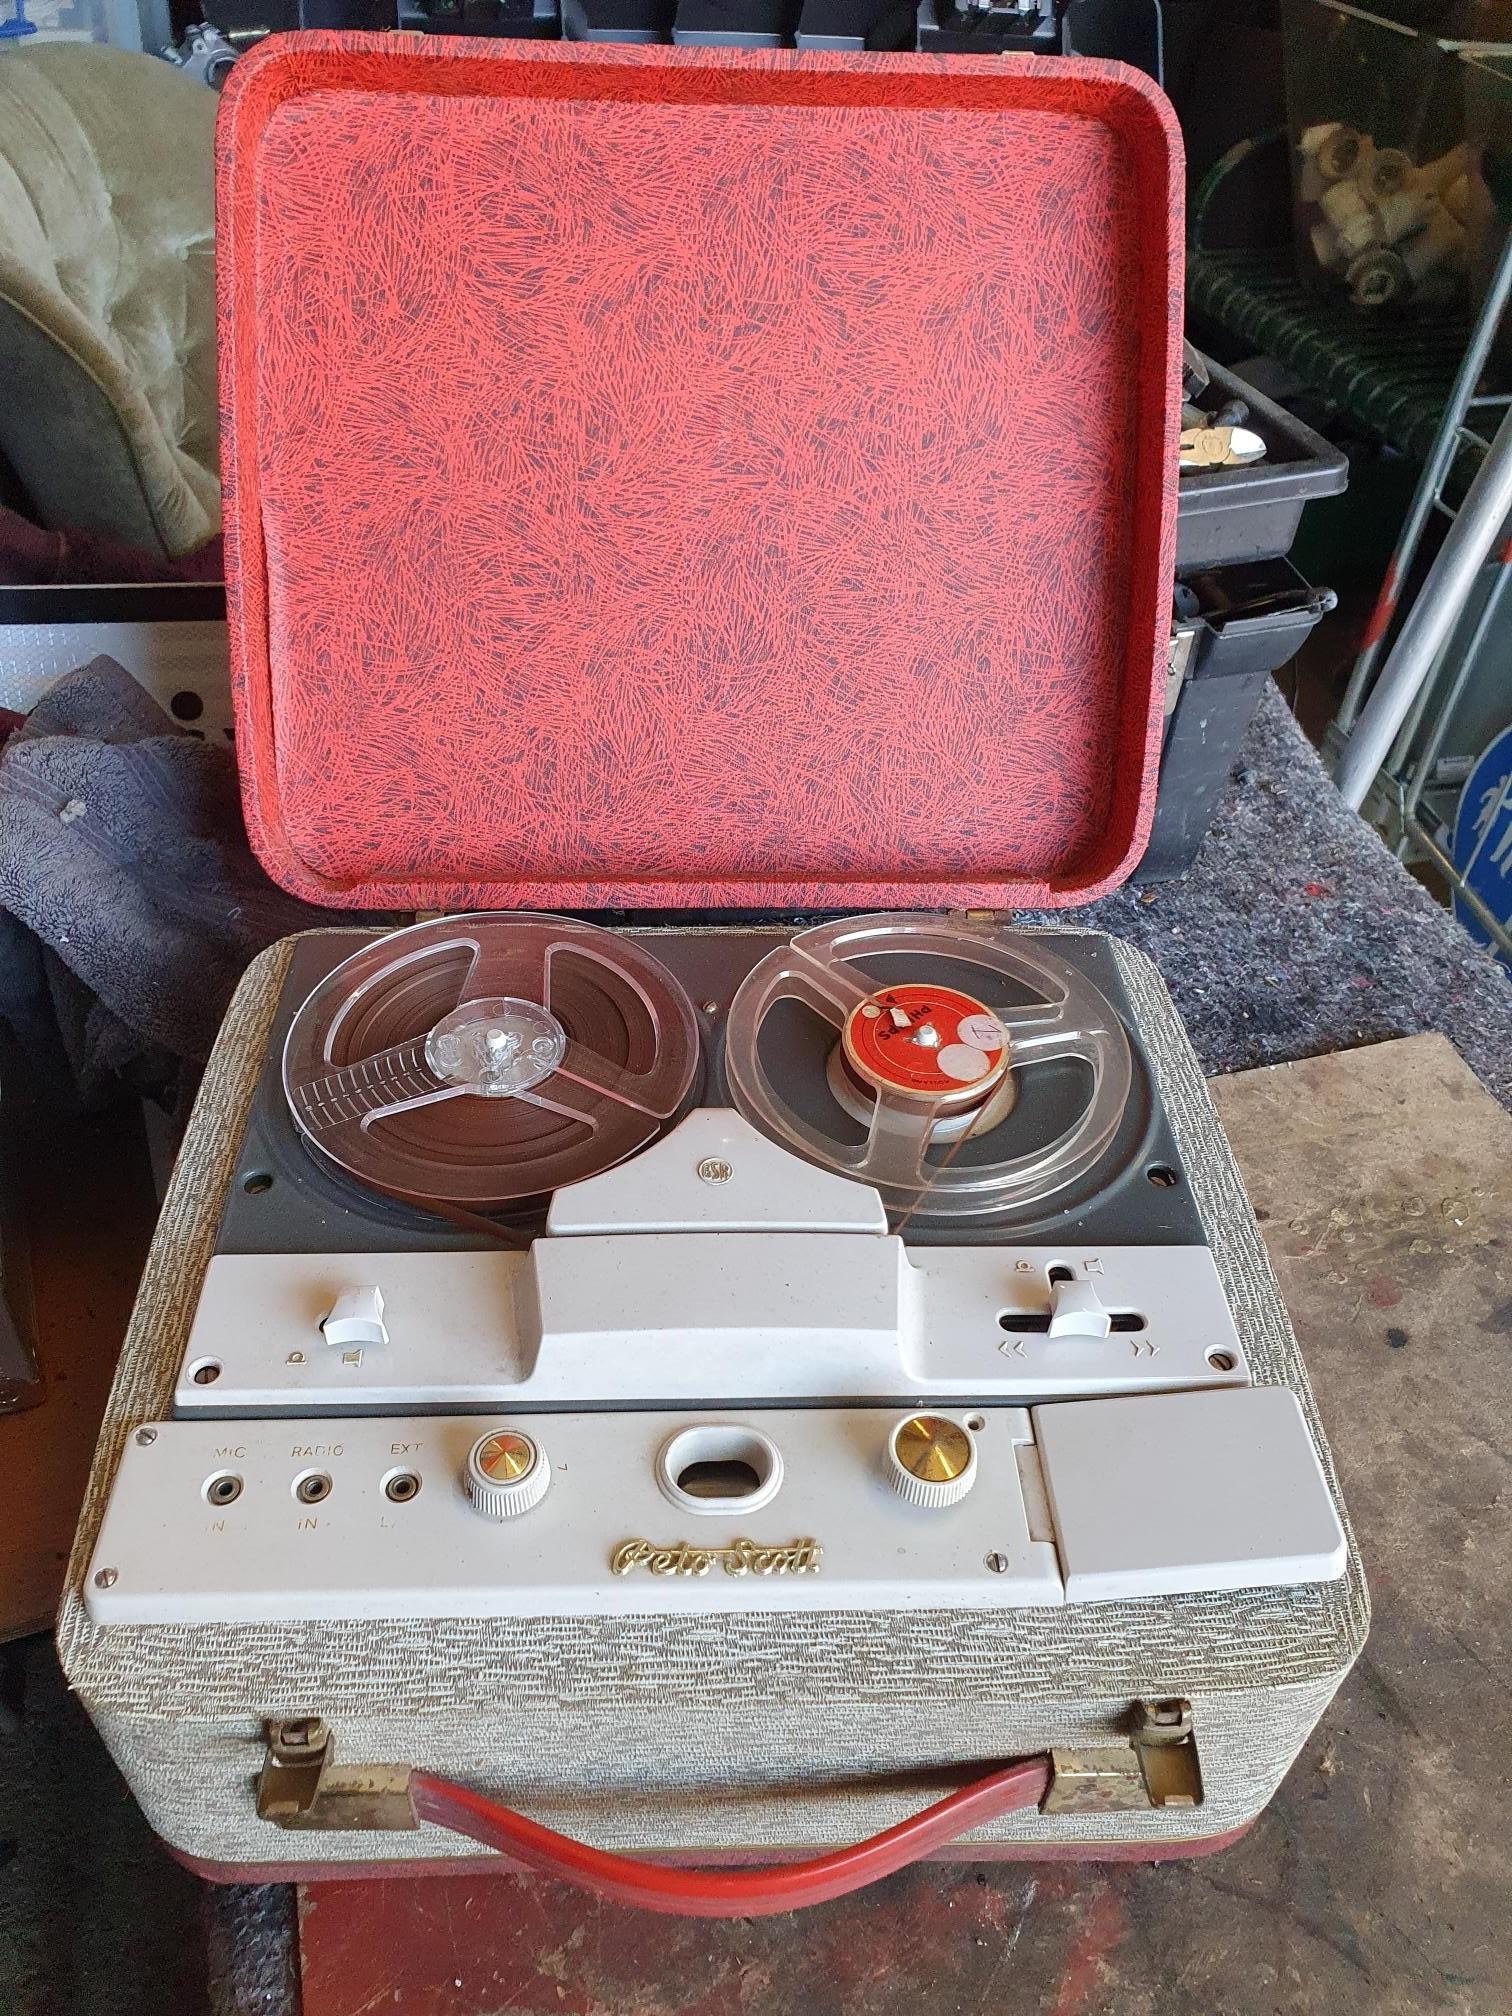 Peto Scott Reel To Reel Portable Tape Recording Machine